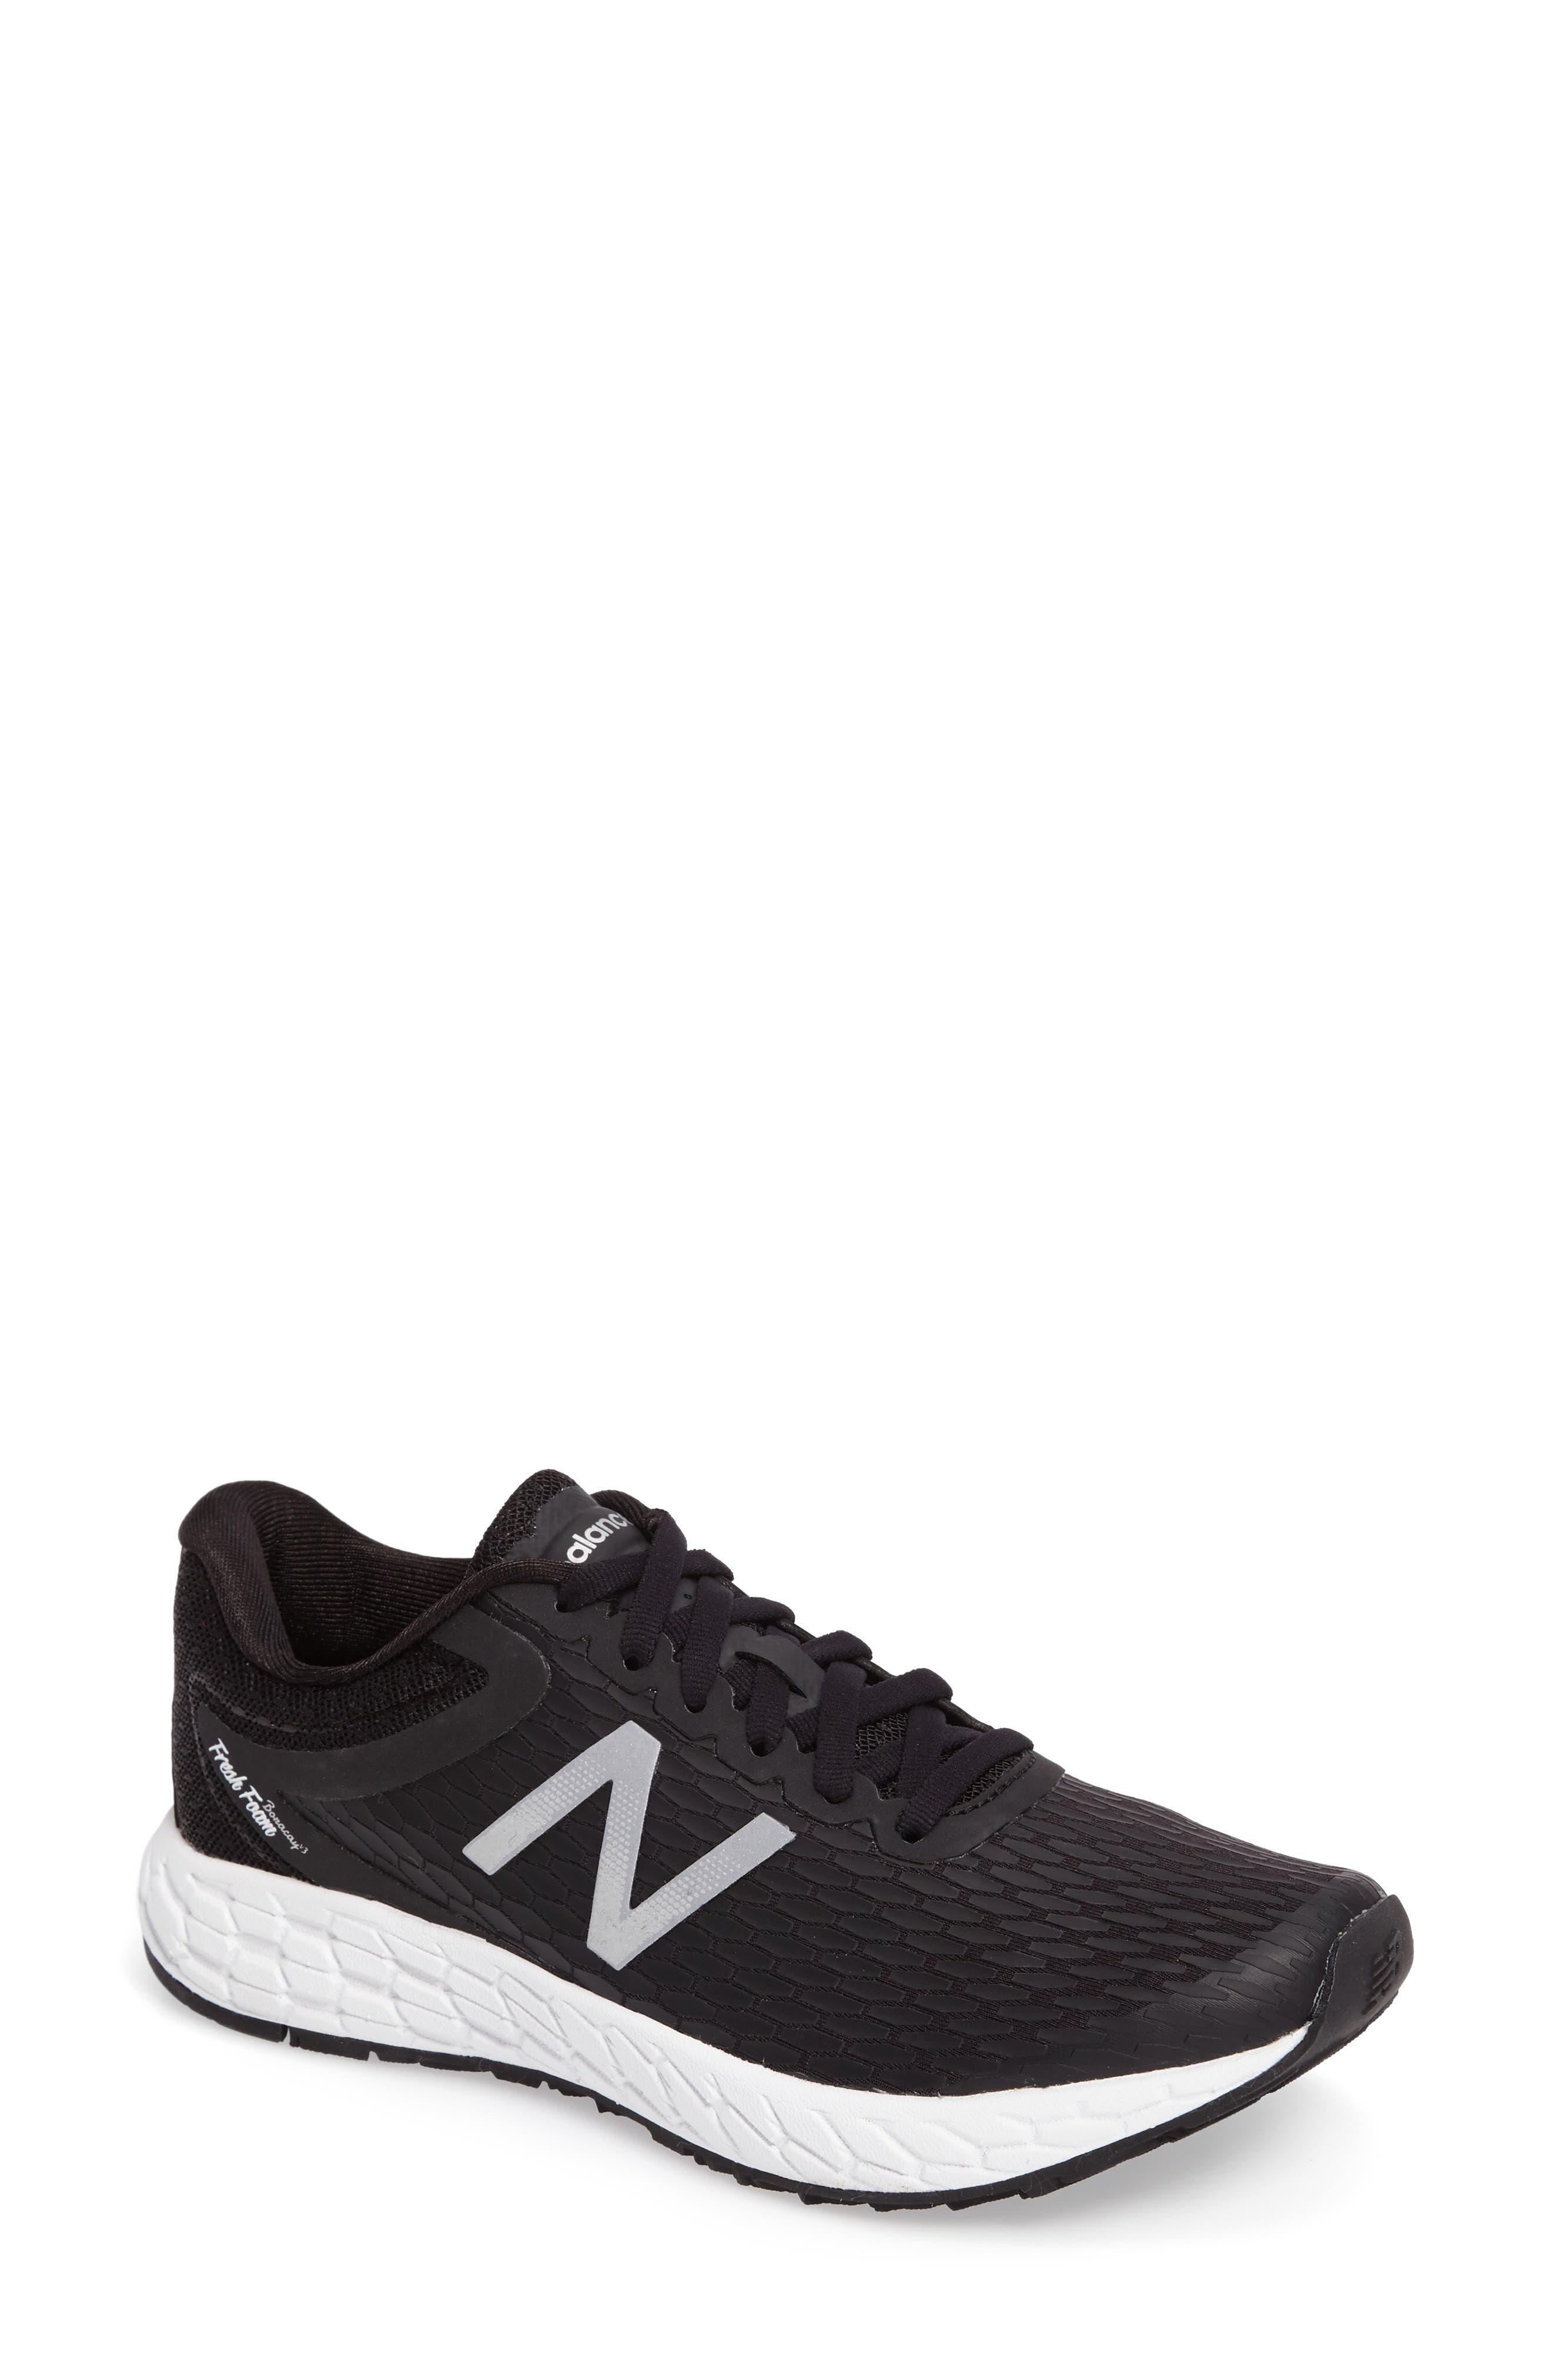 Main Image - New Balance '980 - Fresh Foam Boracay' Running Shoe (Women)